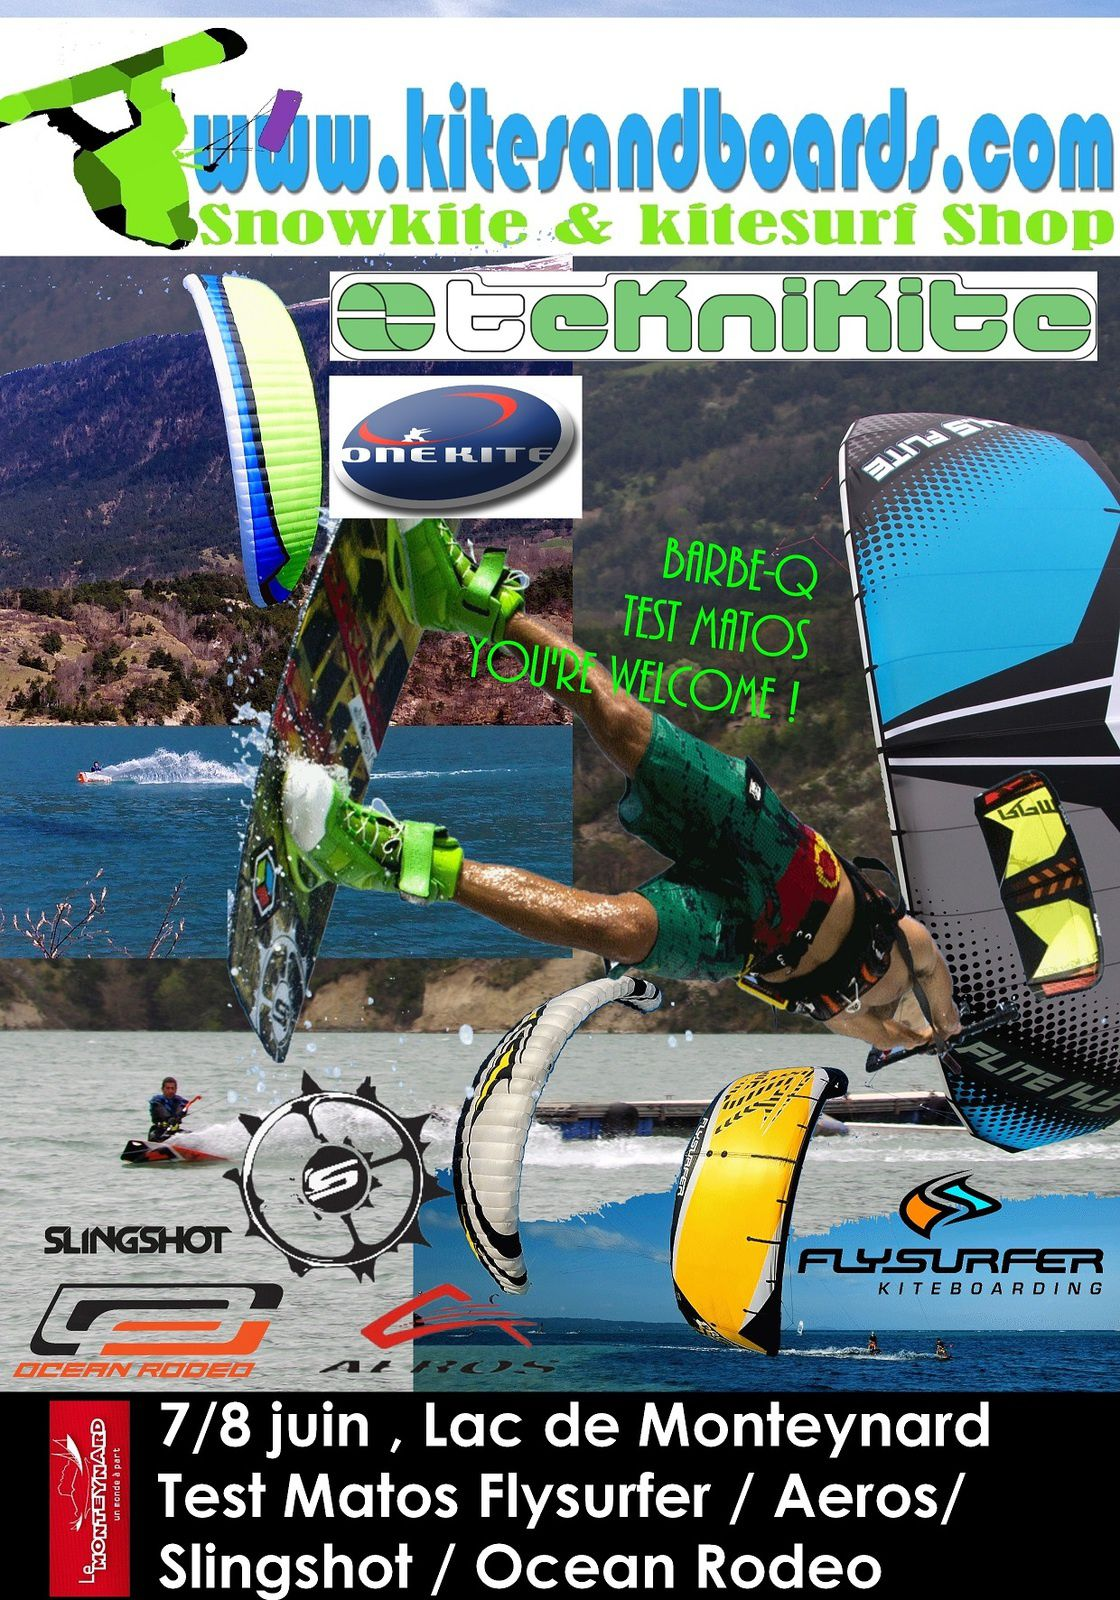 7 et 8 juin, Test matos, barkek, downwind...au lac de Monteynard